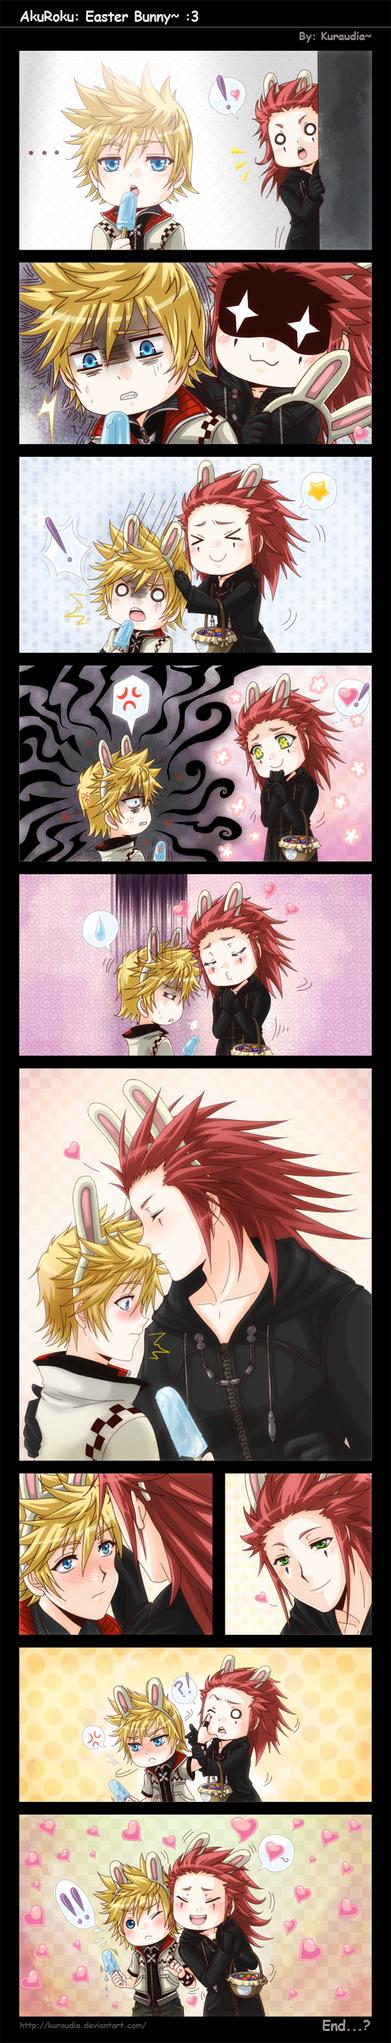 +KH: AkuRoku: Easter Bunny :3+ by kuraudia